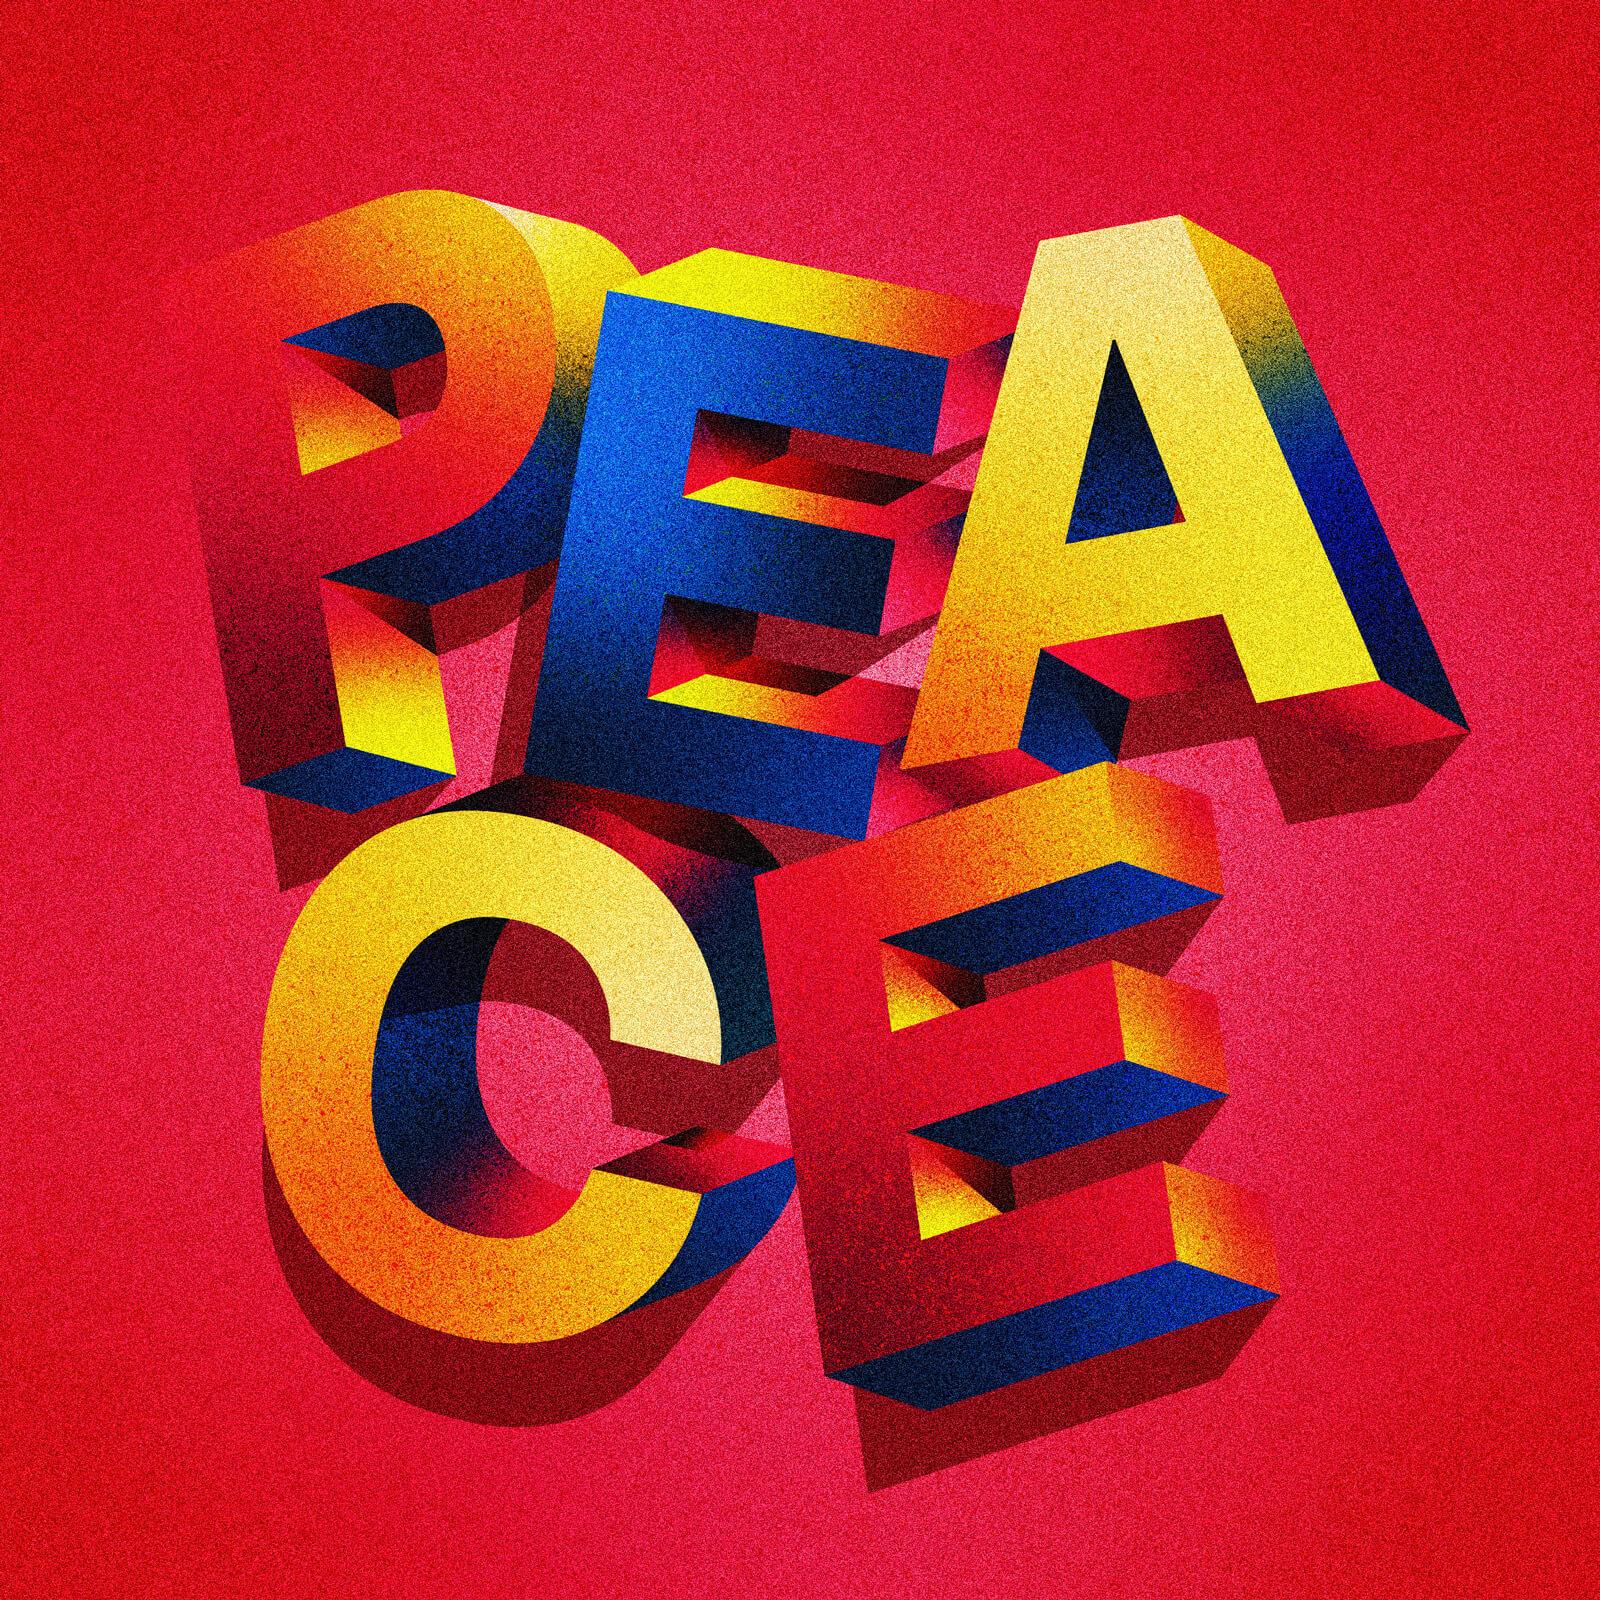 Peace - Alexandre Thomas